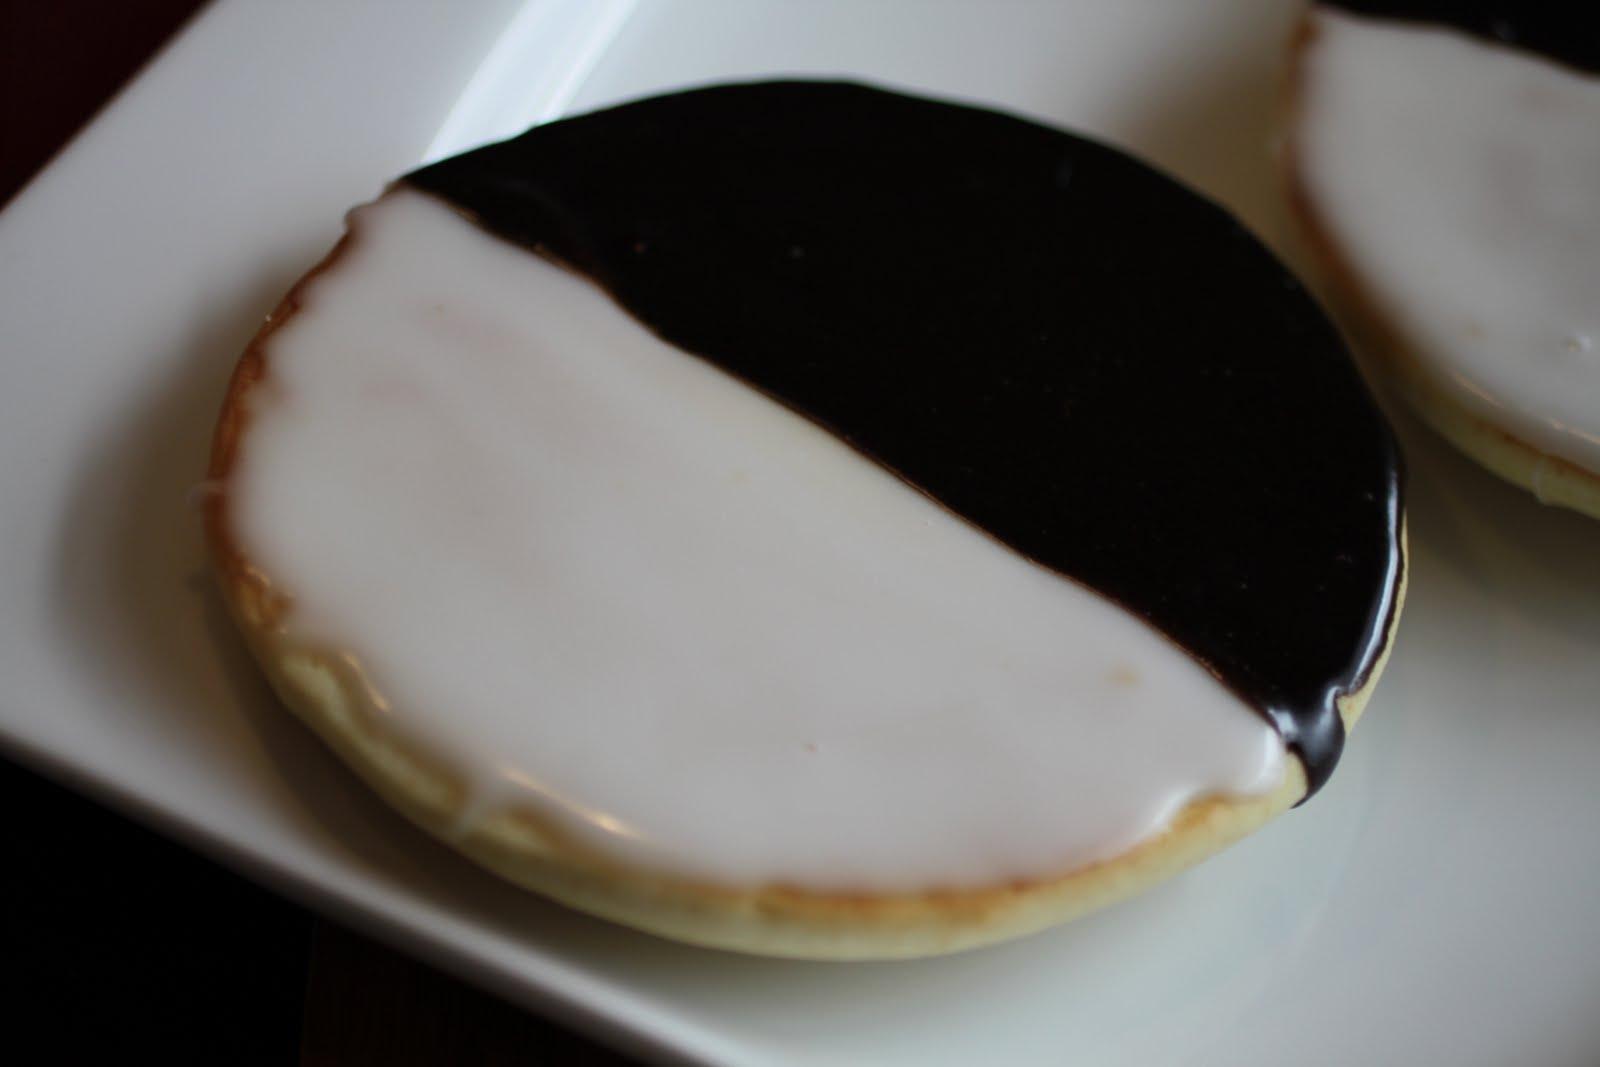 cookies cookie york girlfriend dishmaps recipe recipes alyce biscuit woah hopsin matter racial harmony cake iggy azalea ot deli xl